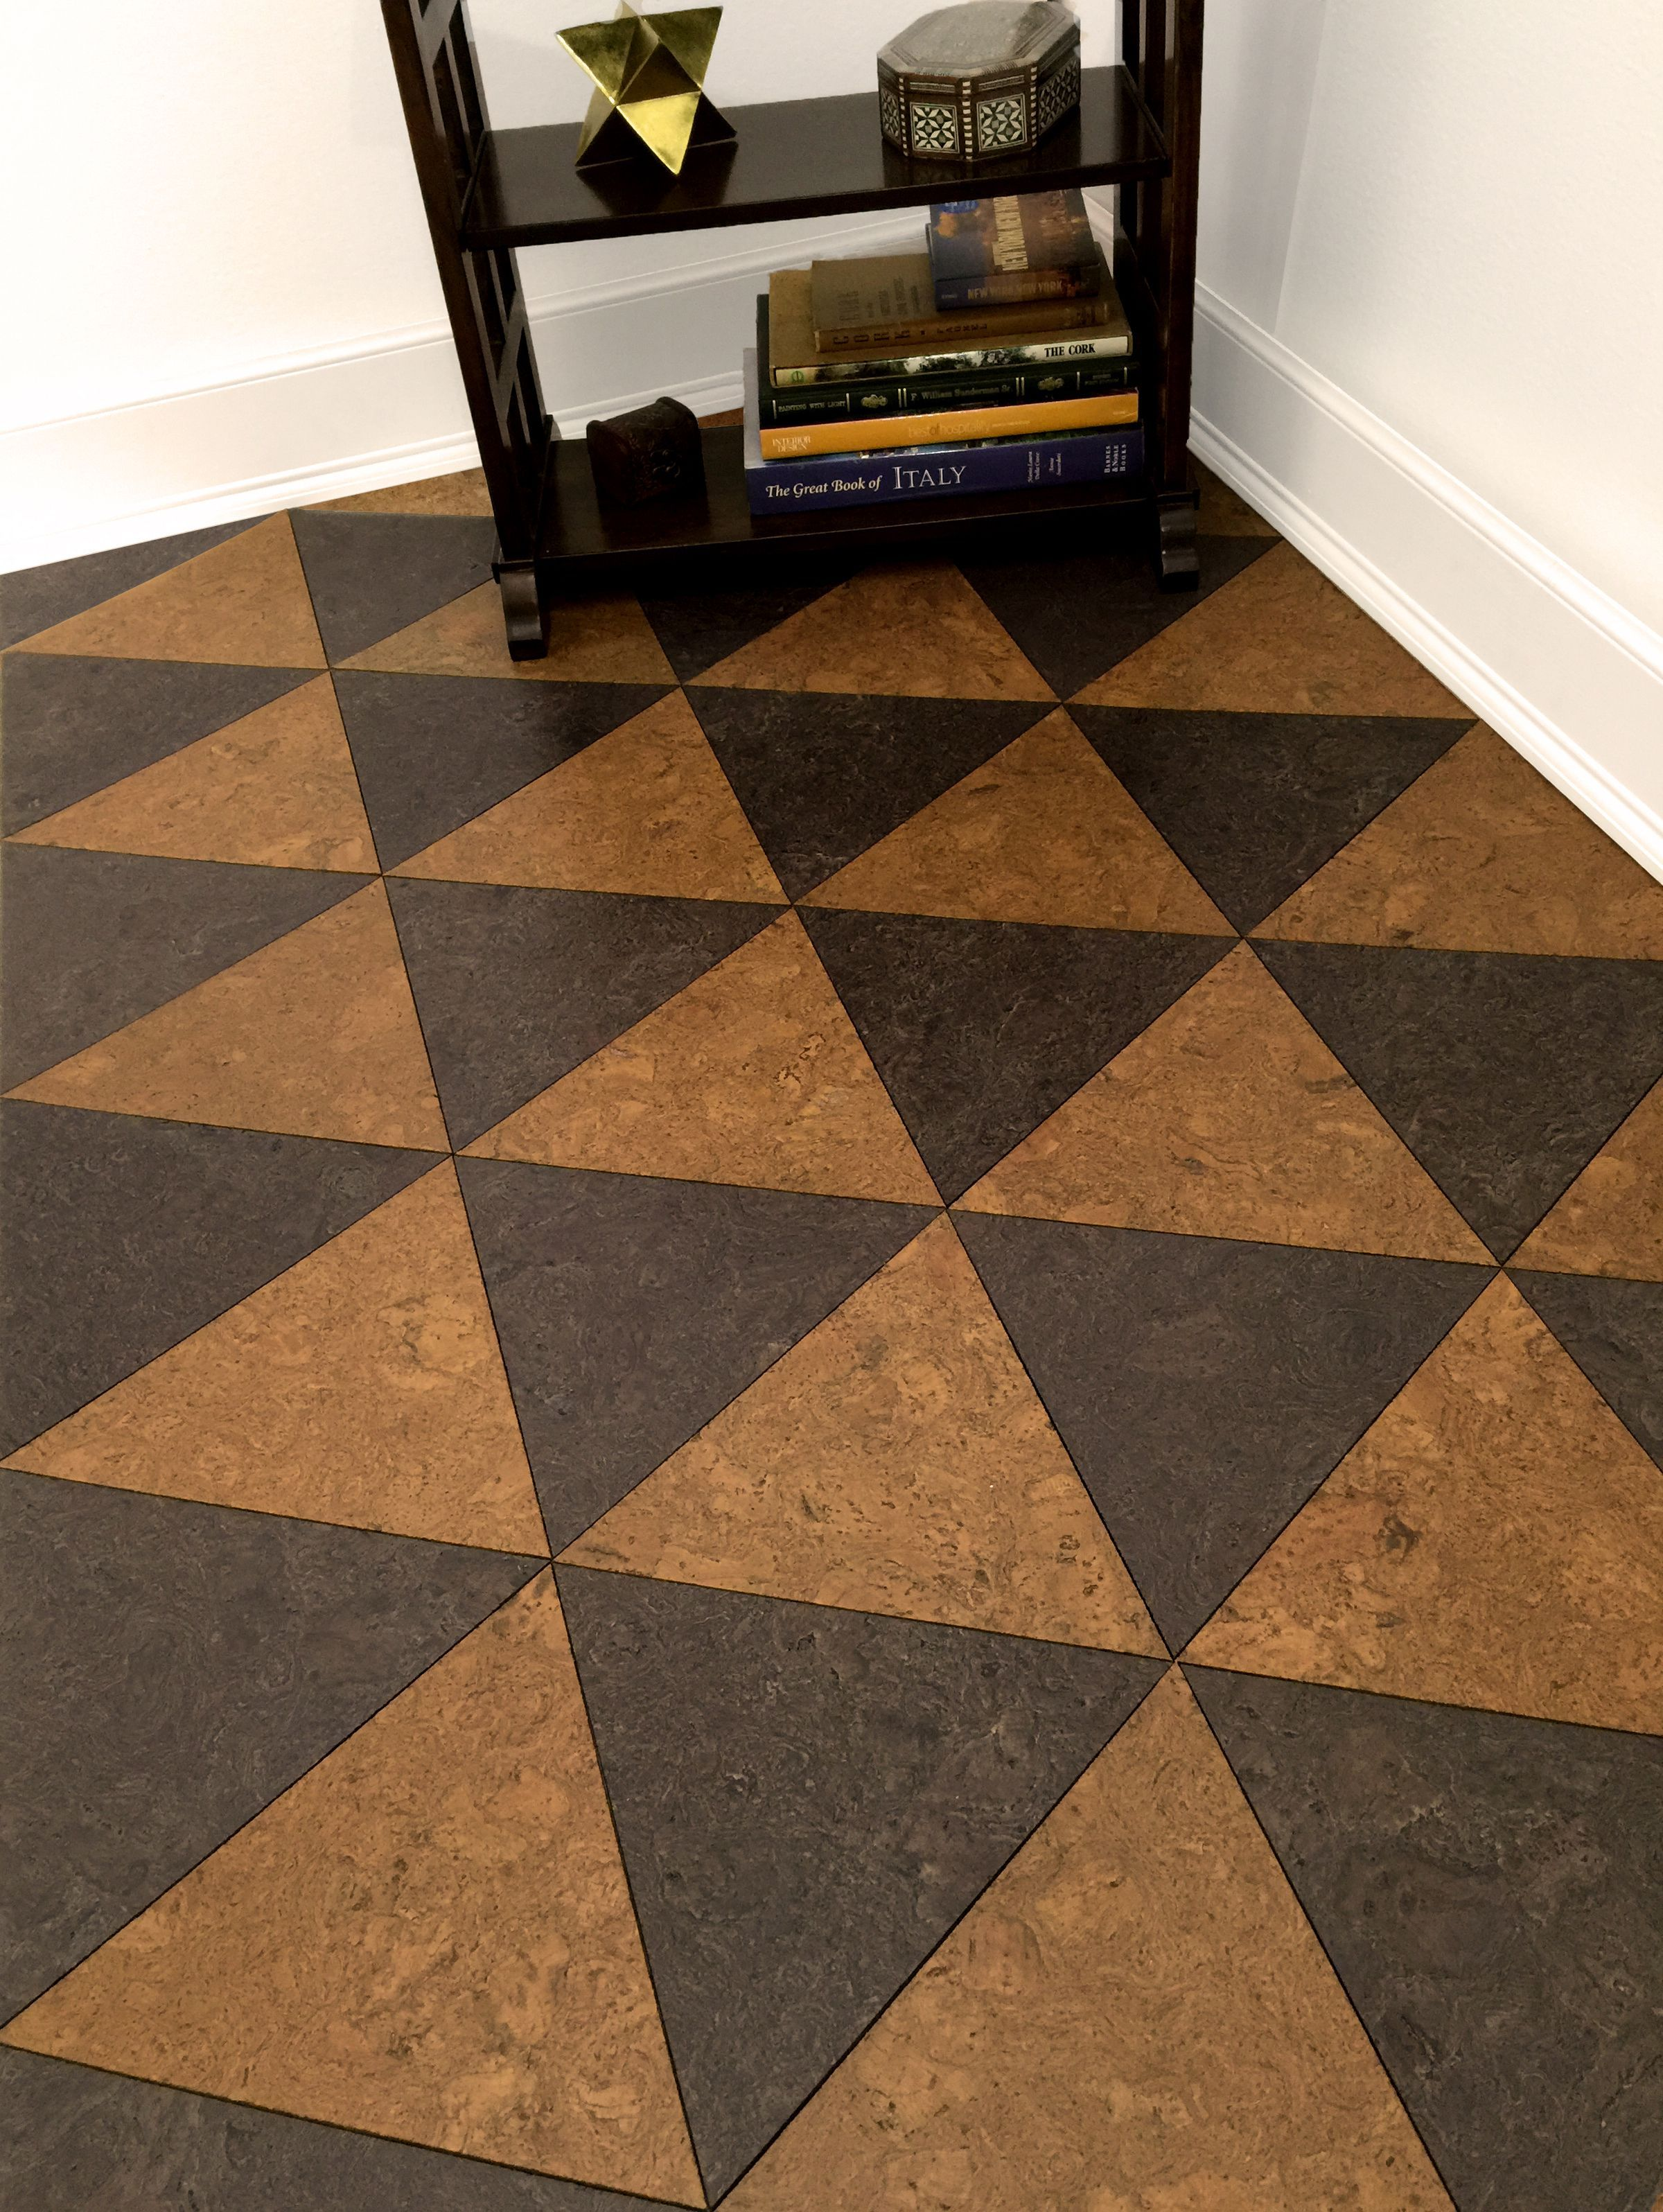 36 Beautiful Alternative Flooring Ideas Image Alternative Flooring Cork Flooring Ceramic Floor Tiles